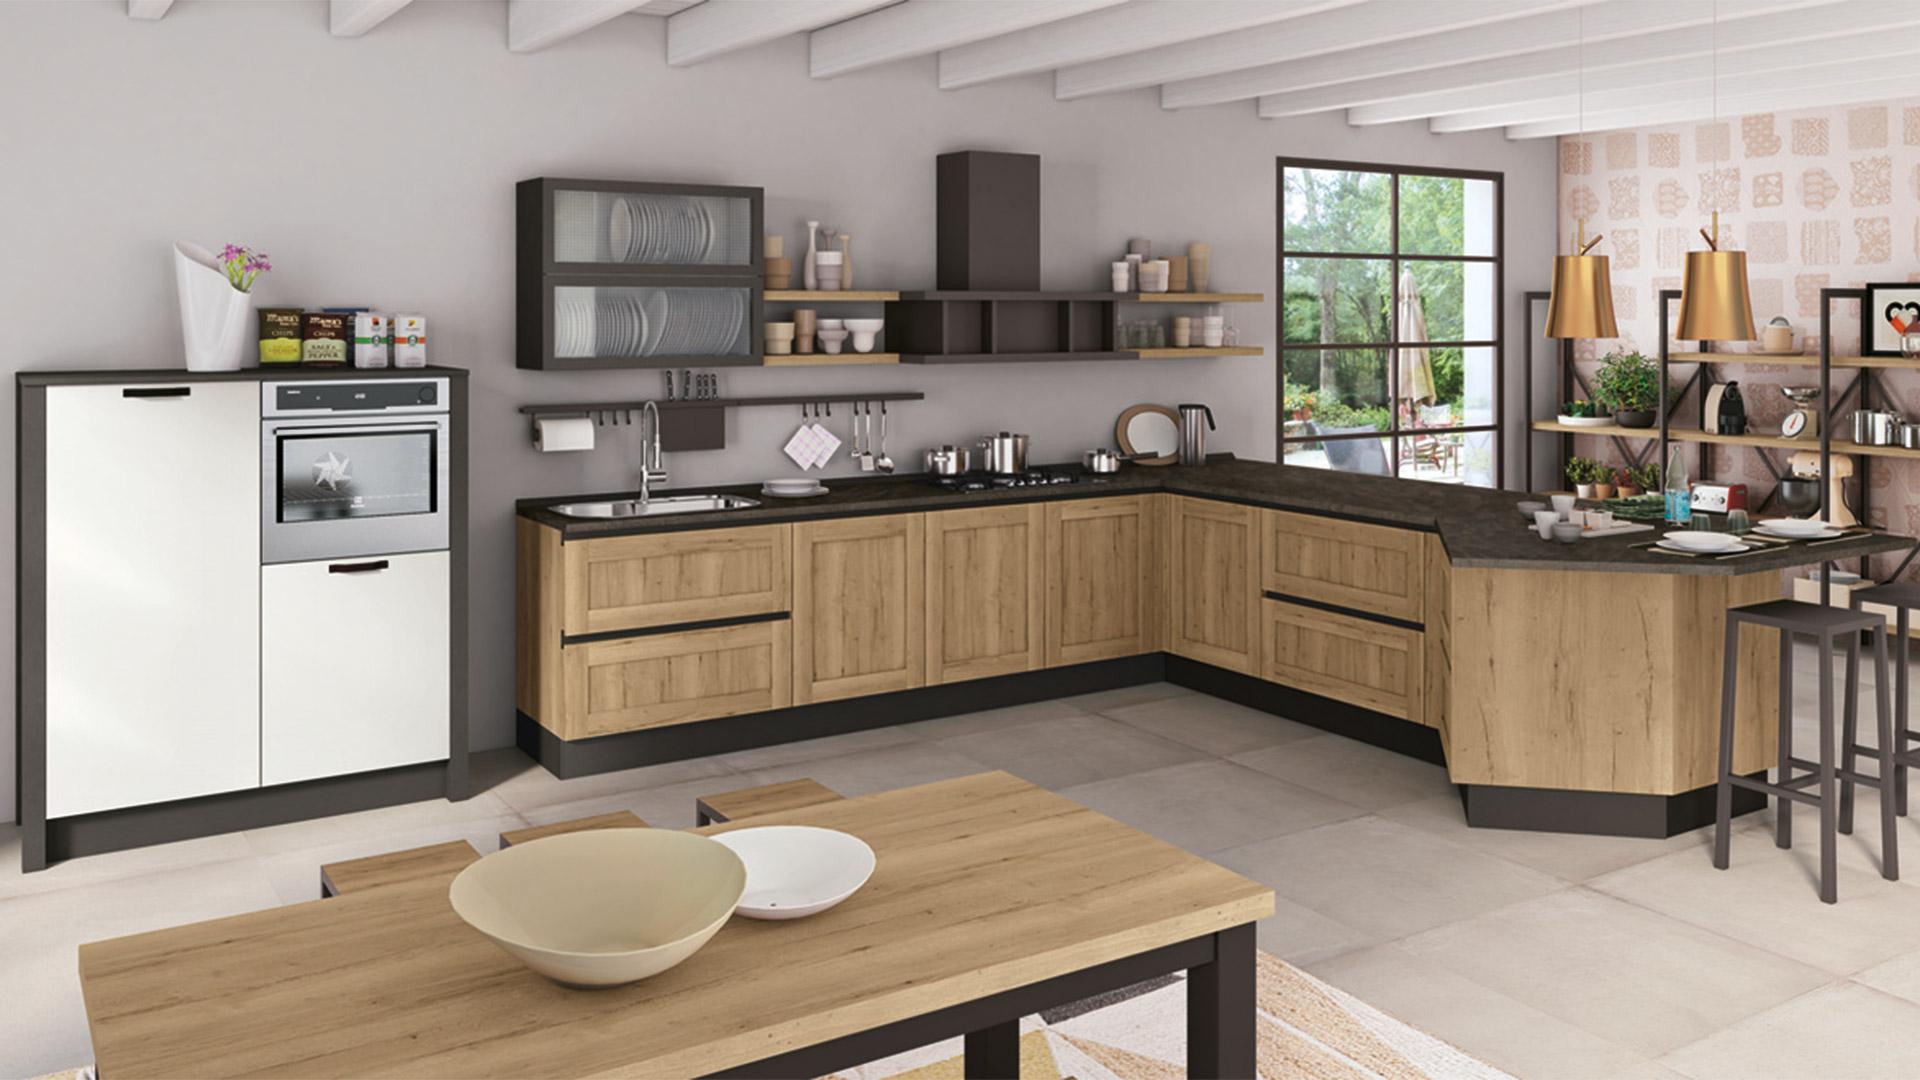 2592_kyra-telaio-cucina-ambientata-20